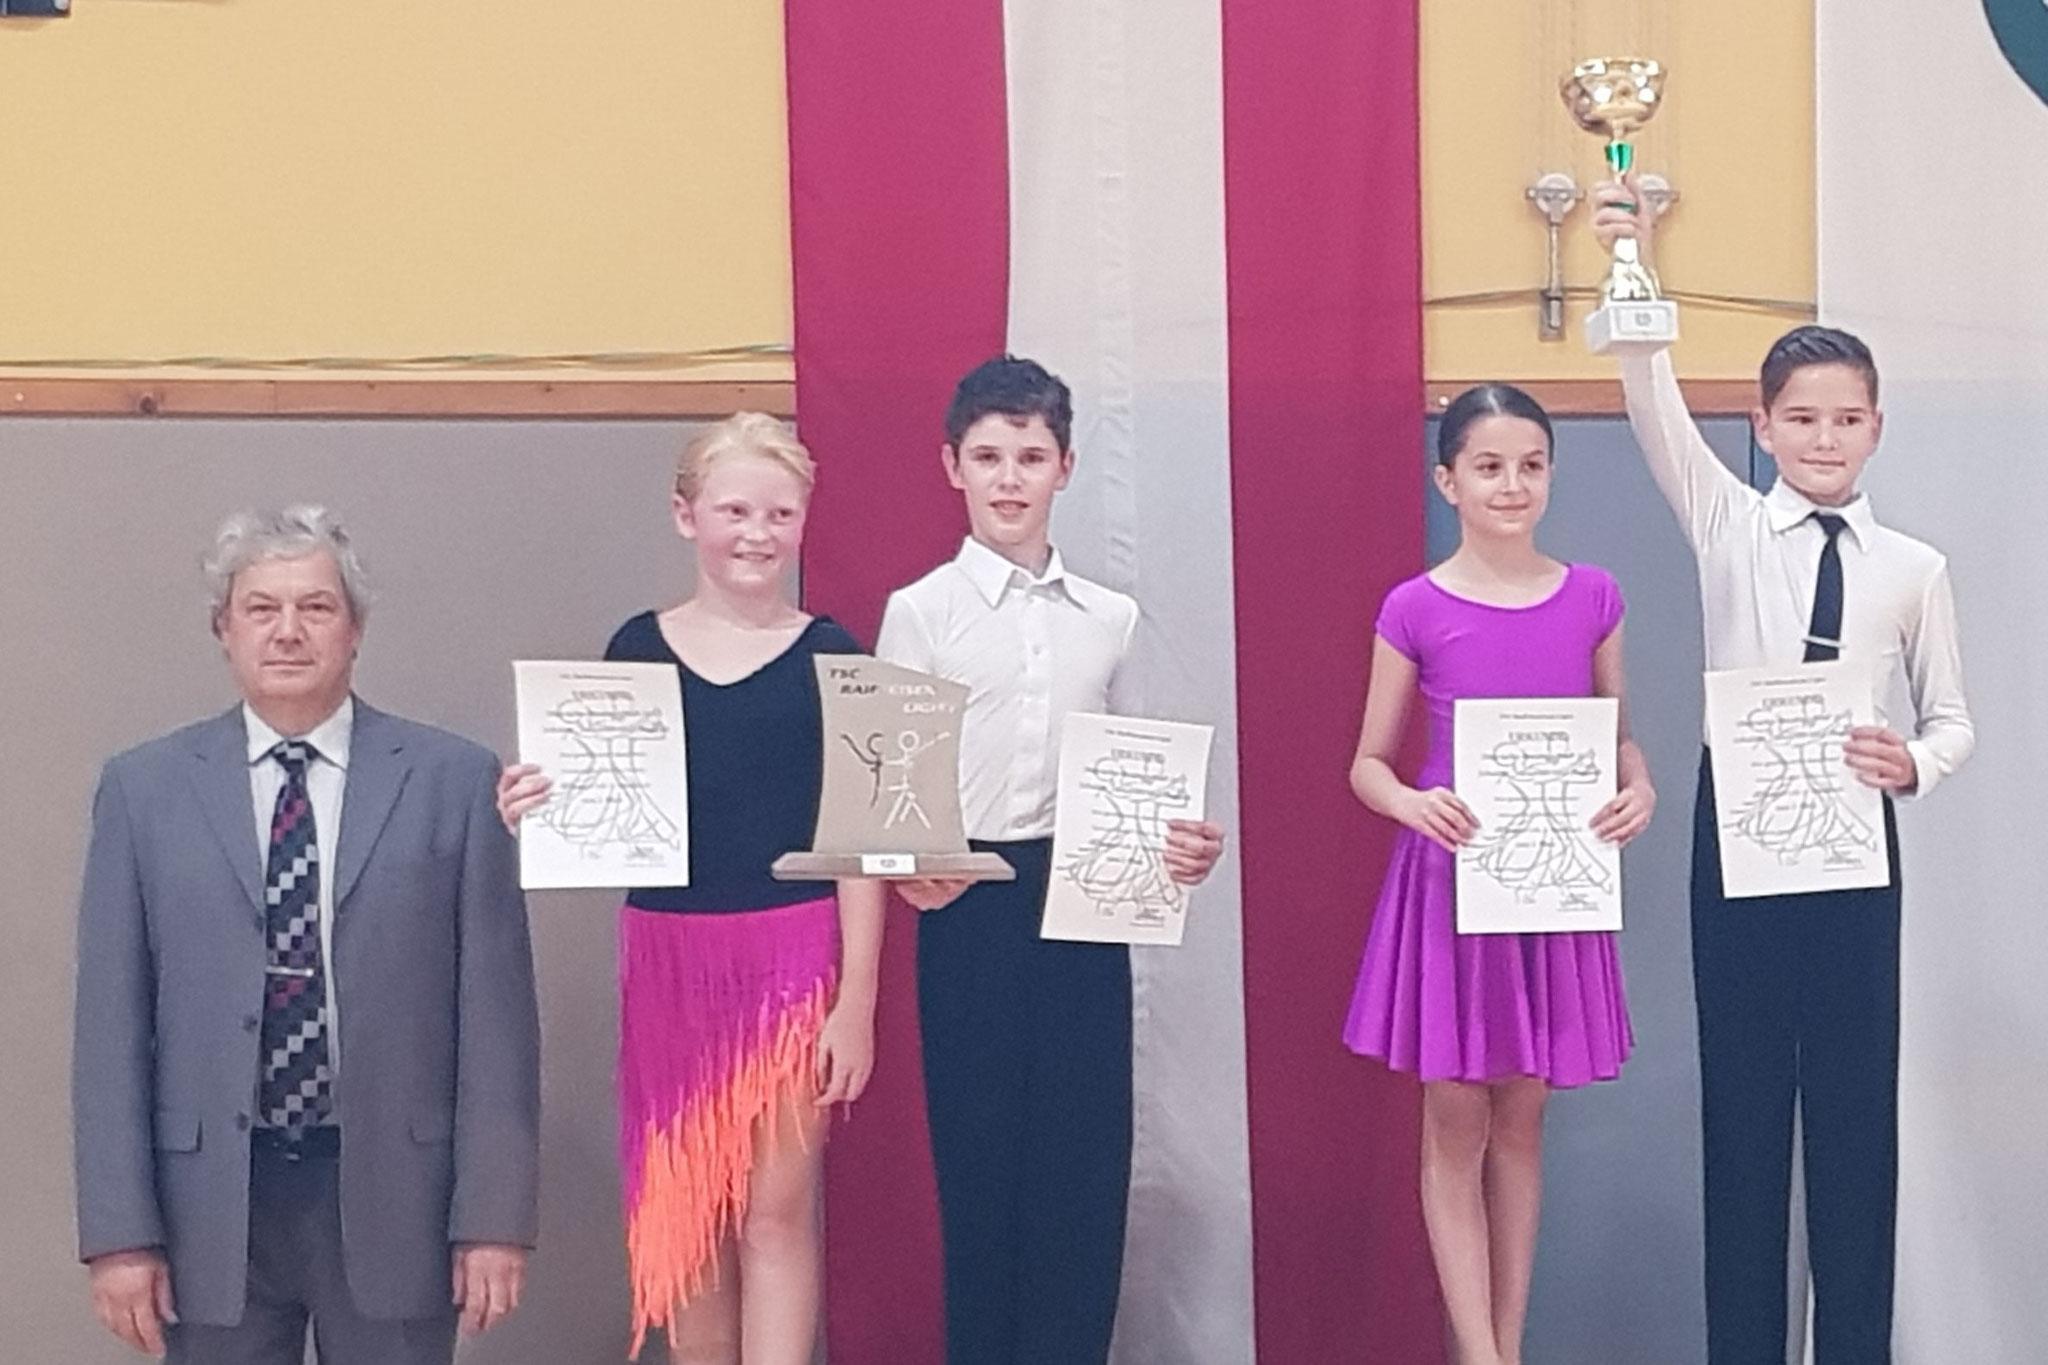 Schüler Standard D - 1. Emma Darabos/Matyas Beke - Gala Te (Ungarn)